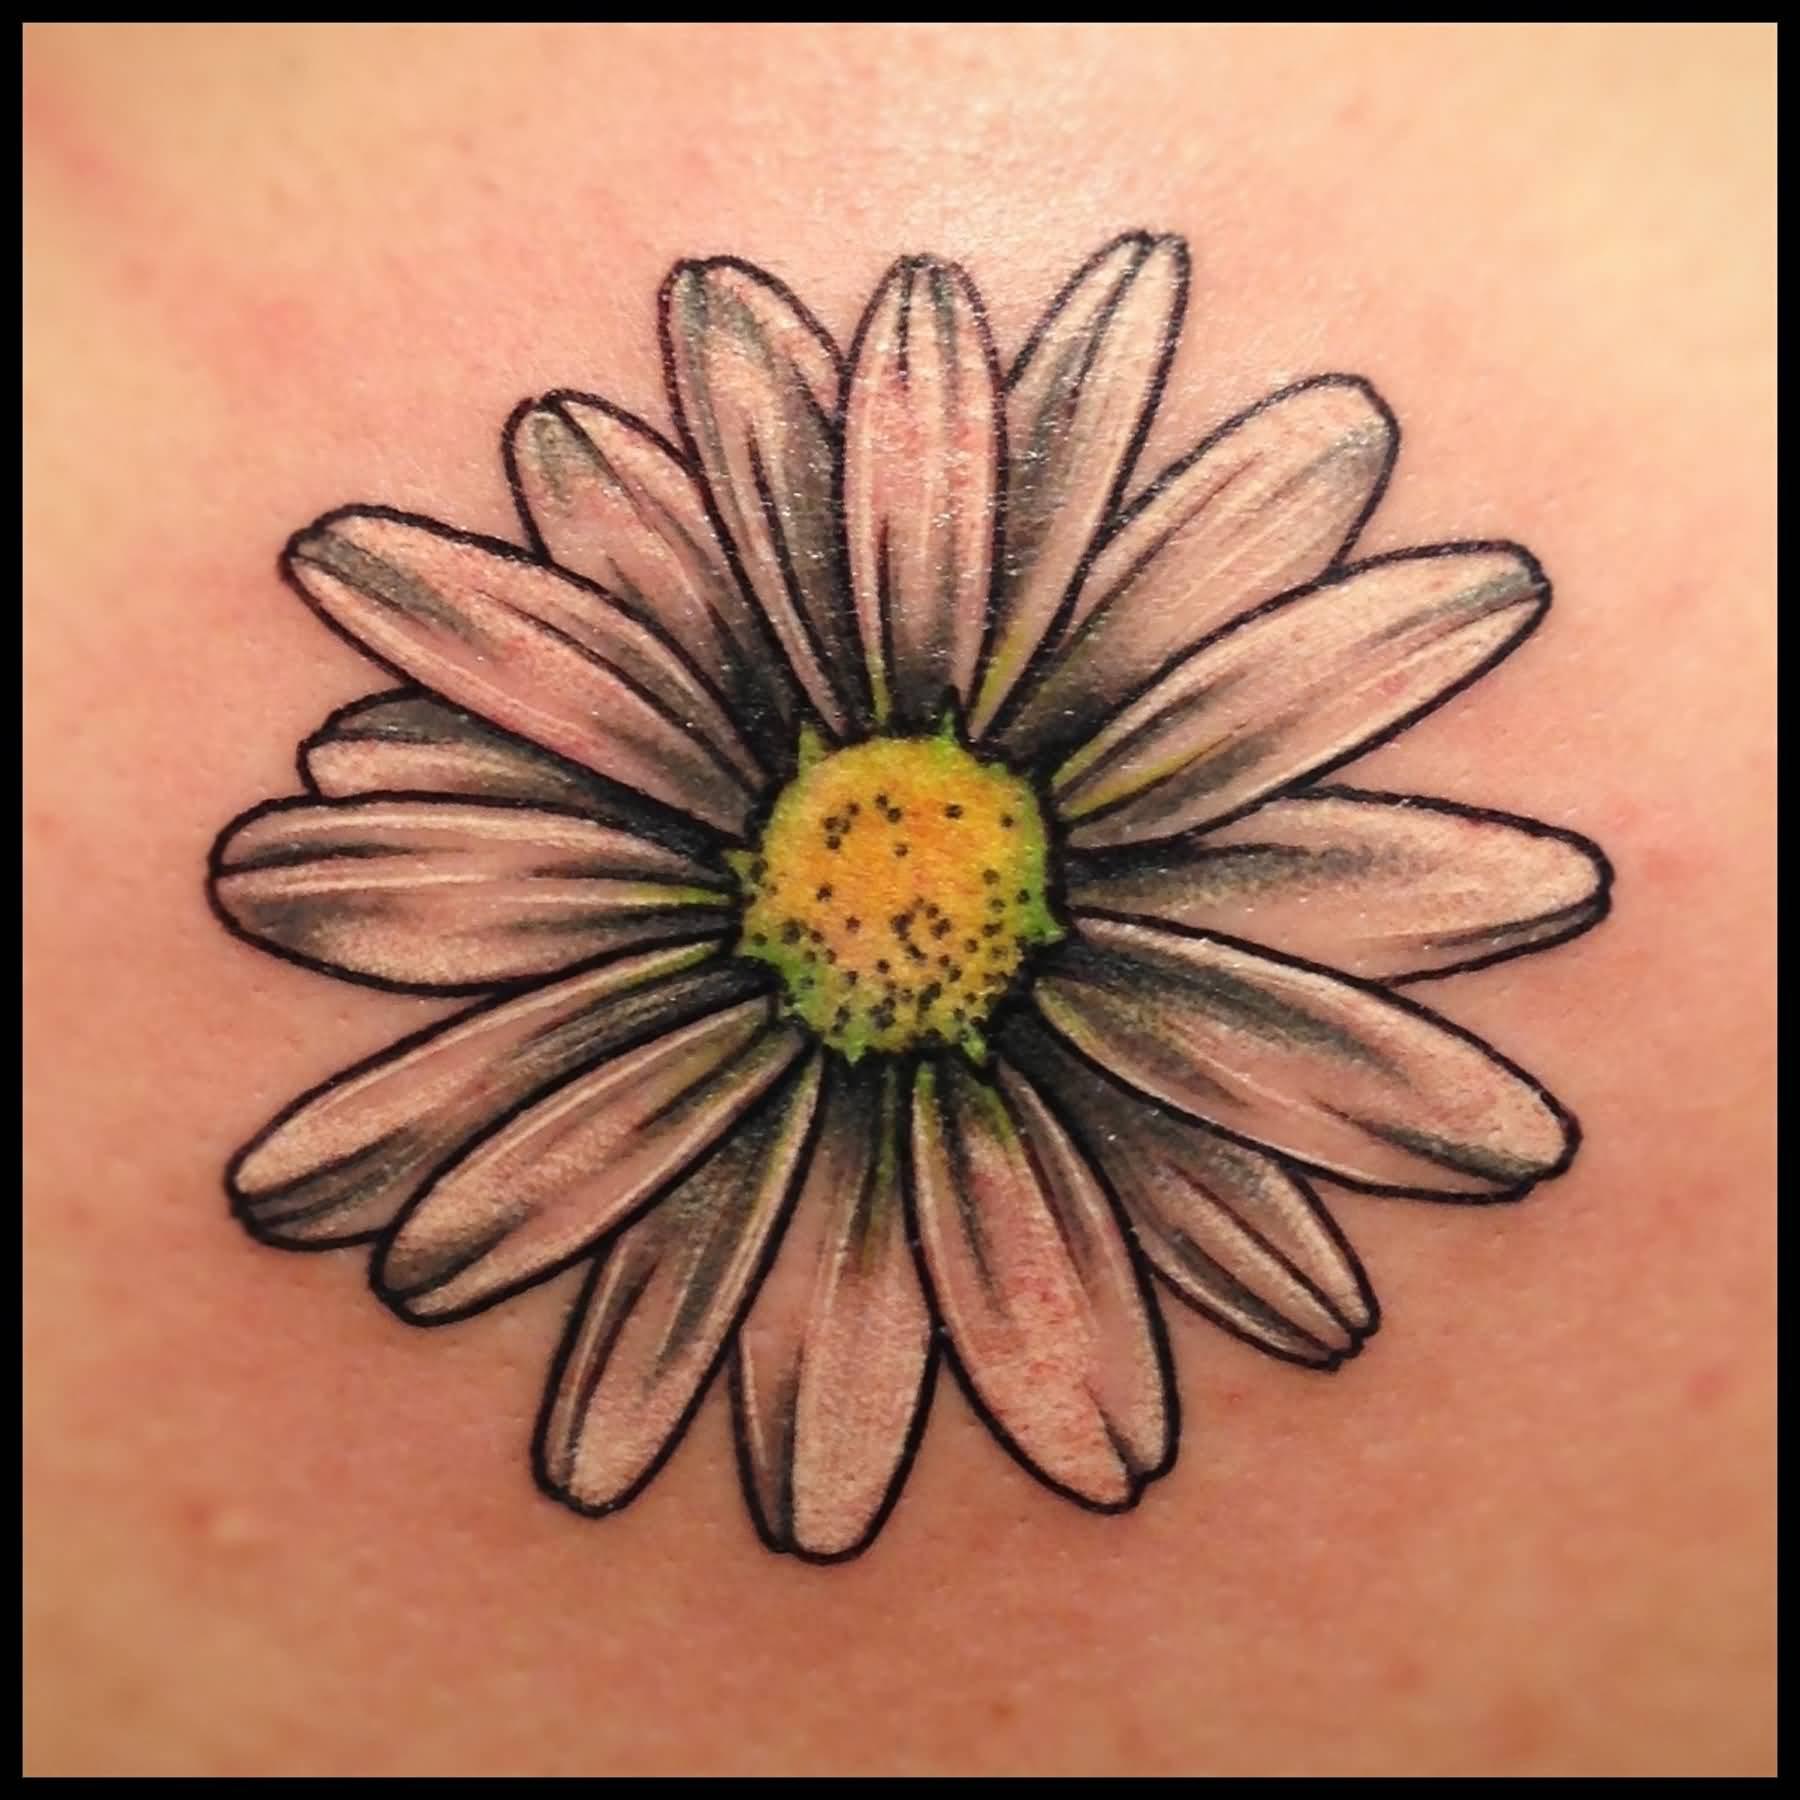 Black And Grey Daisy Tattoo On Side Rib By Aliens Tattoos